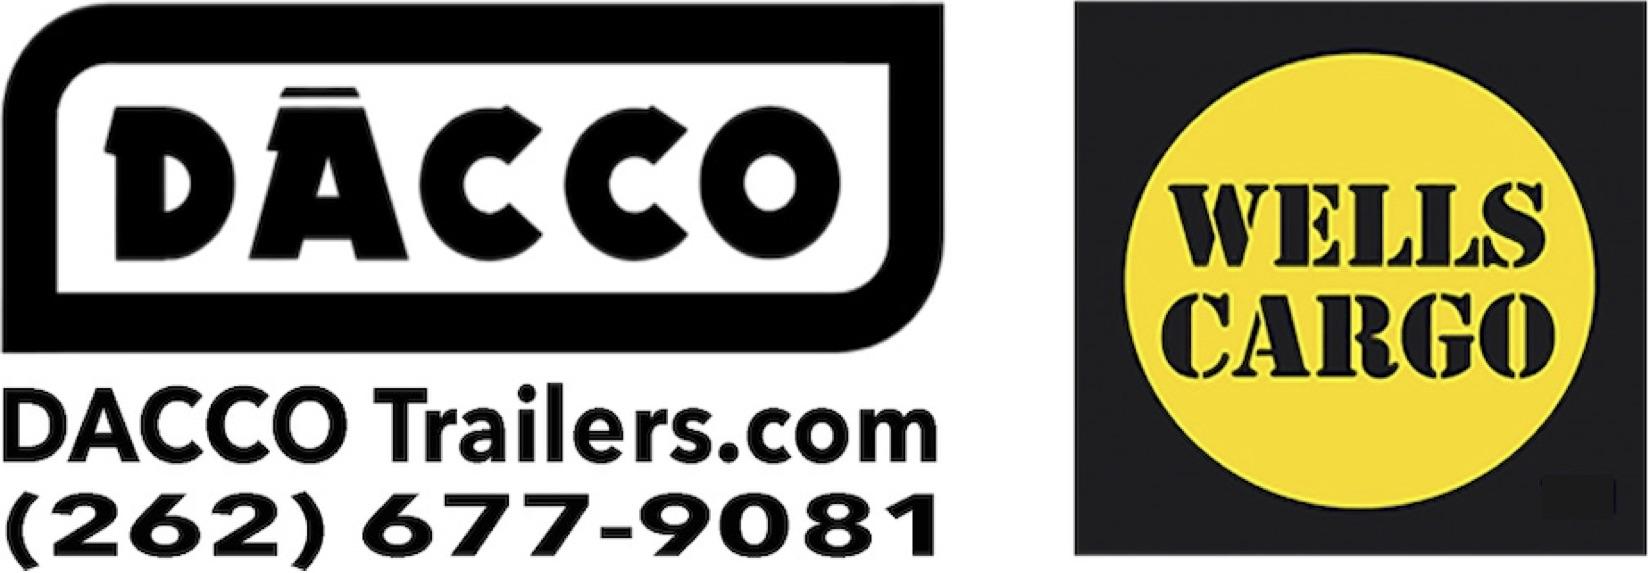 DACCO Trailers